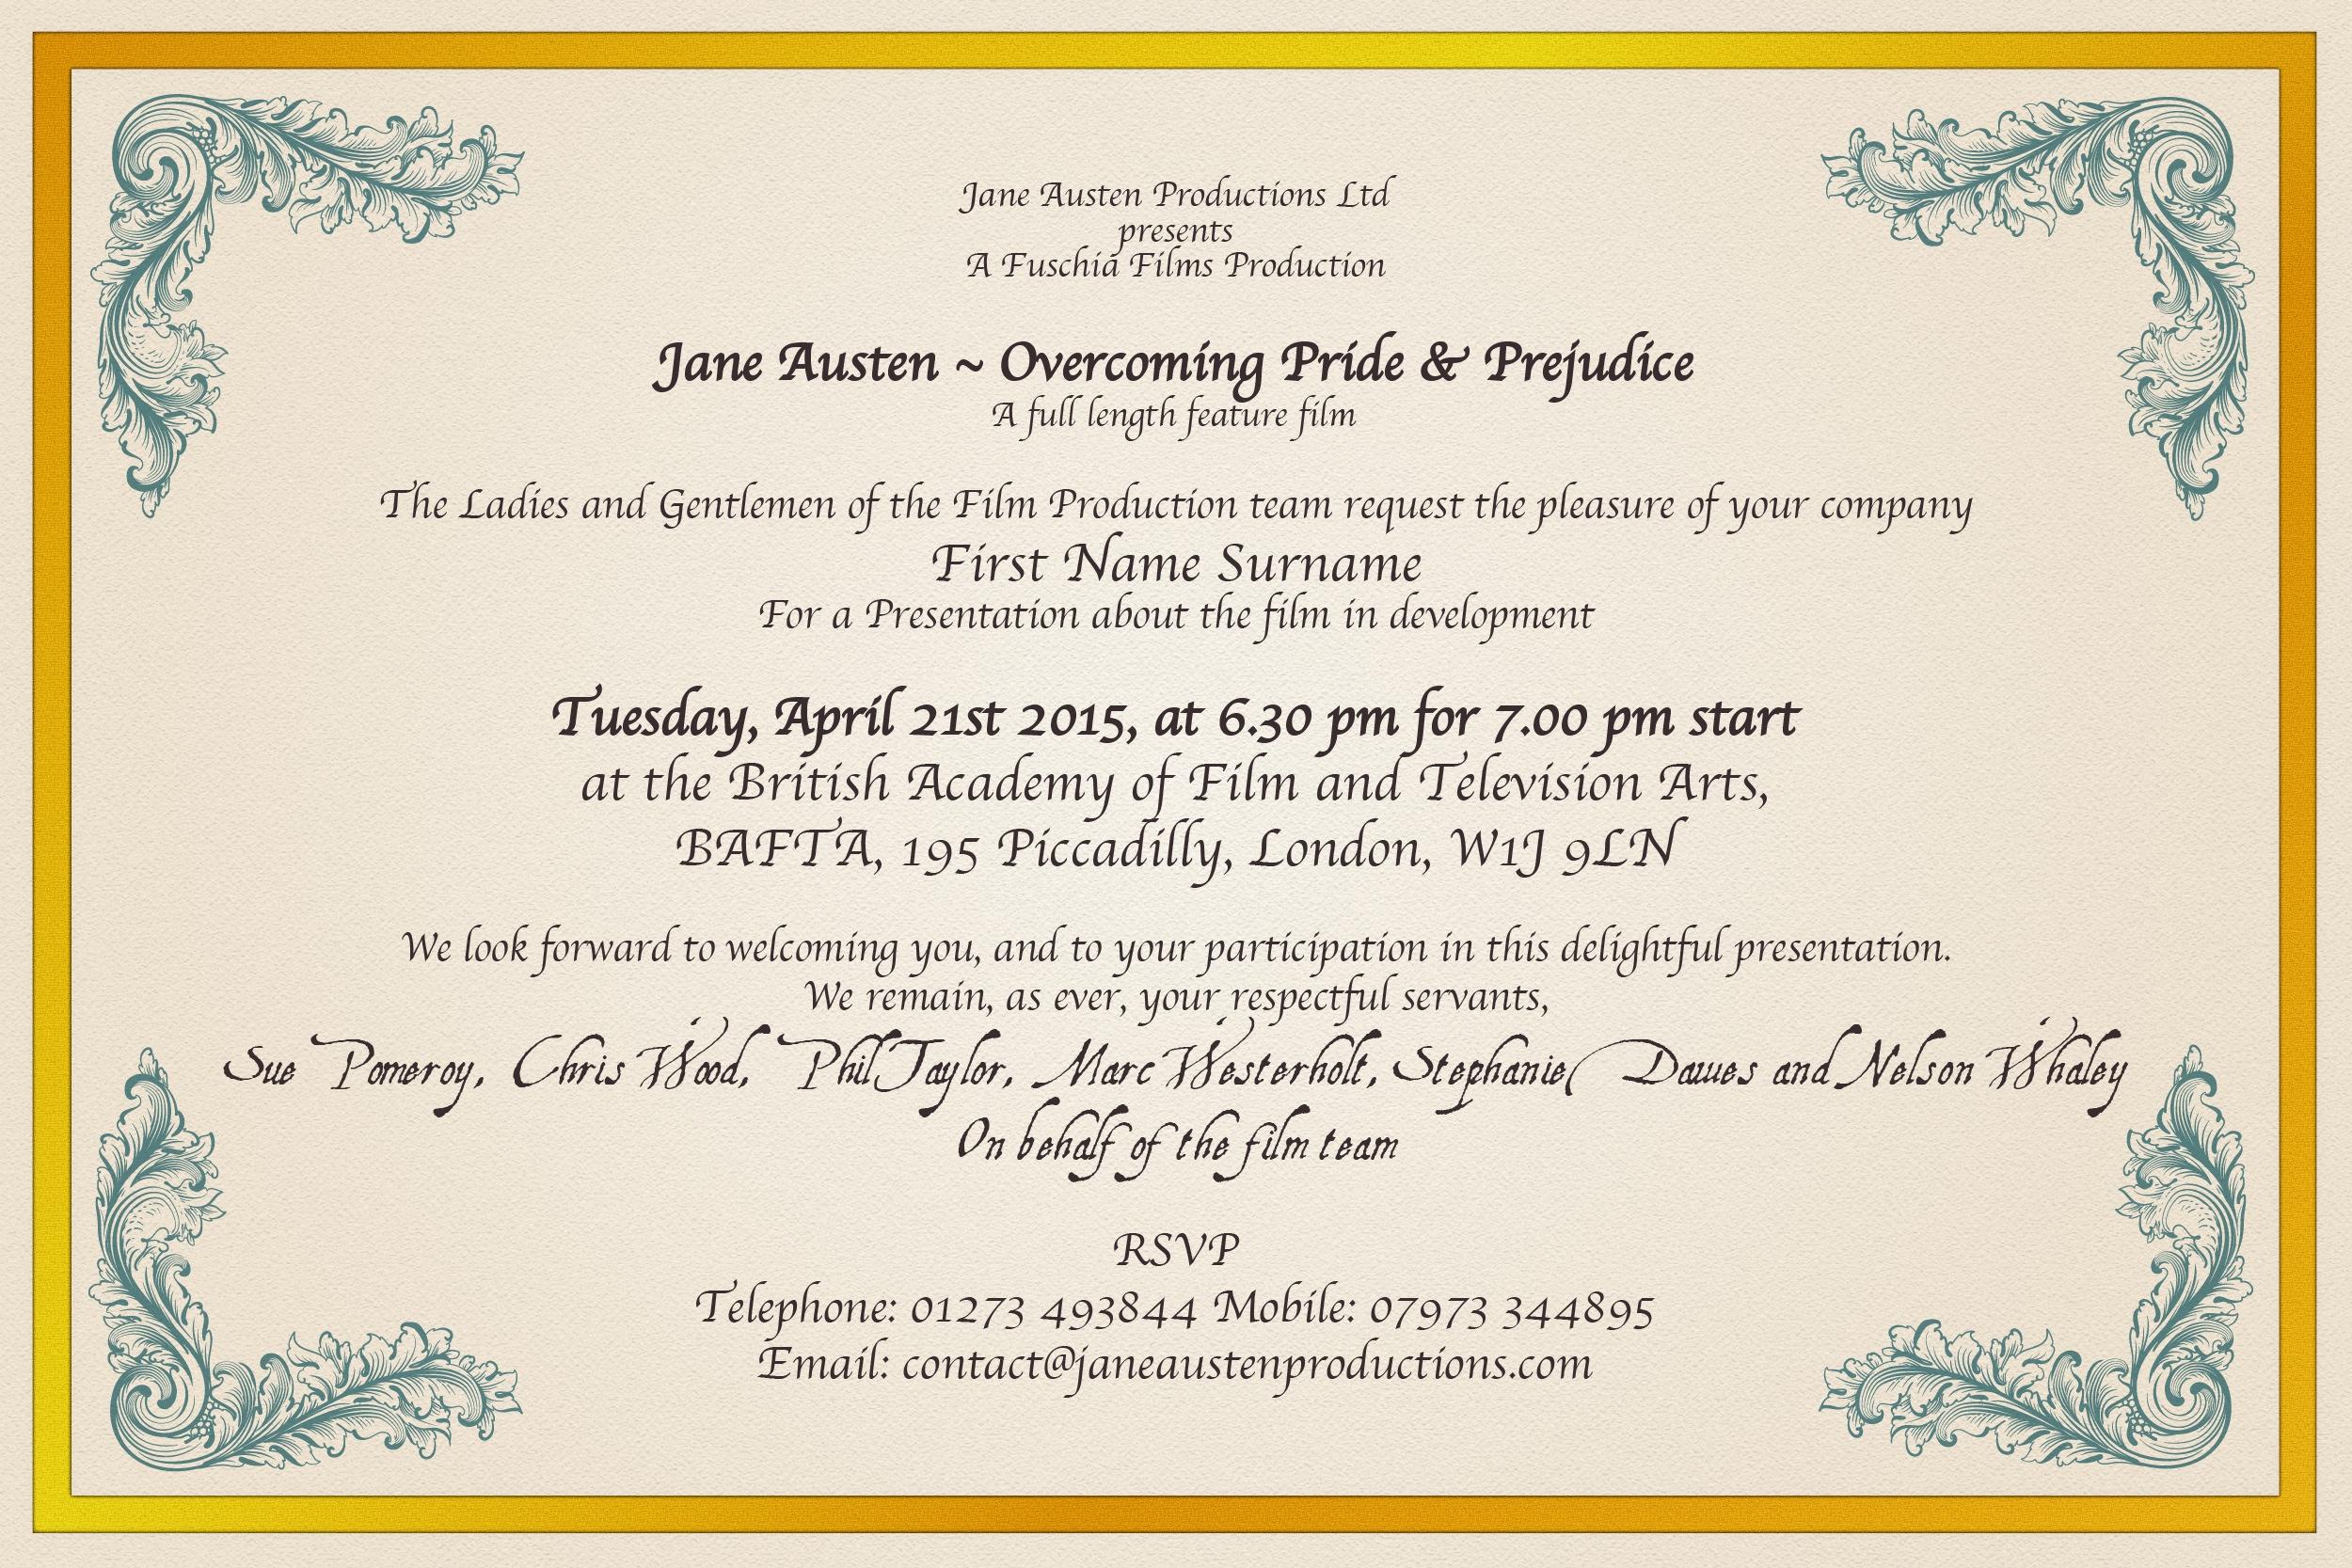 jane-austen-BAFTA-presentation-invite_Invite